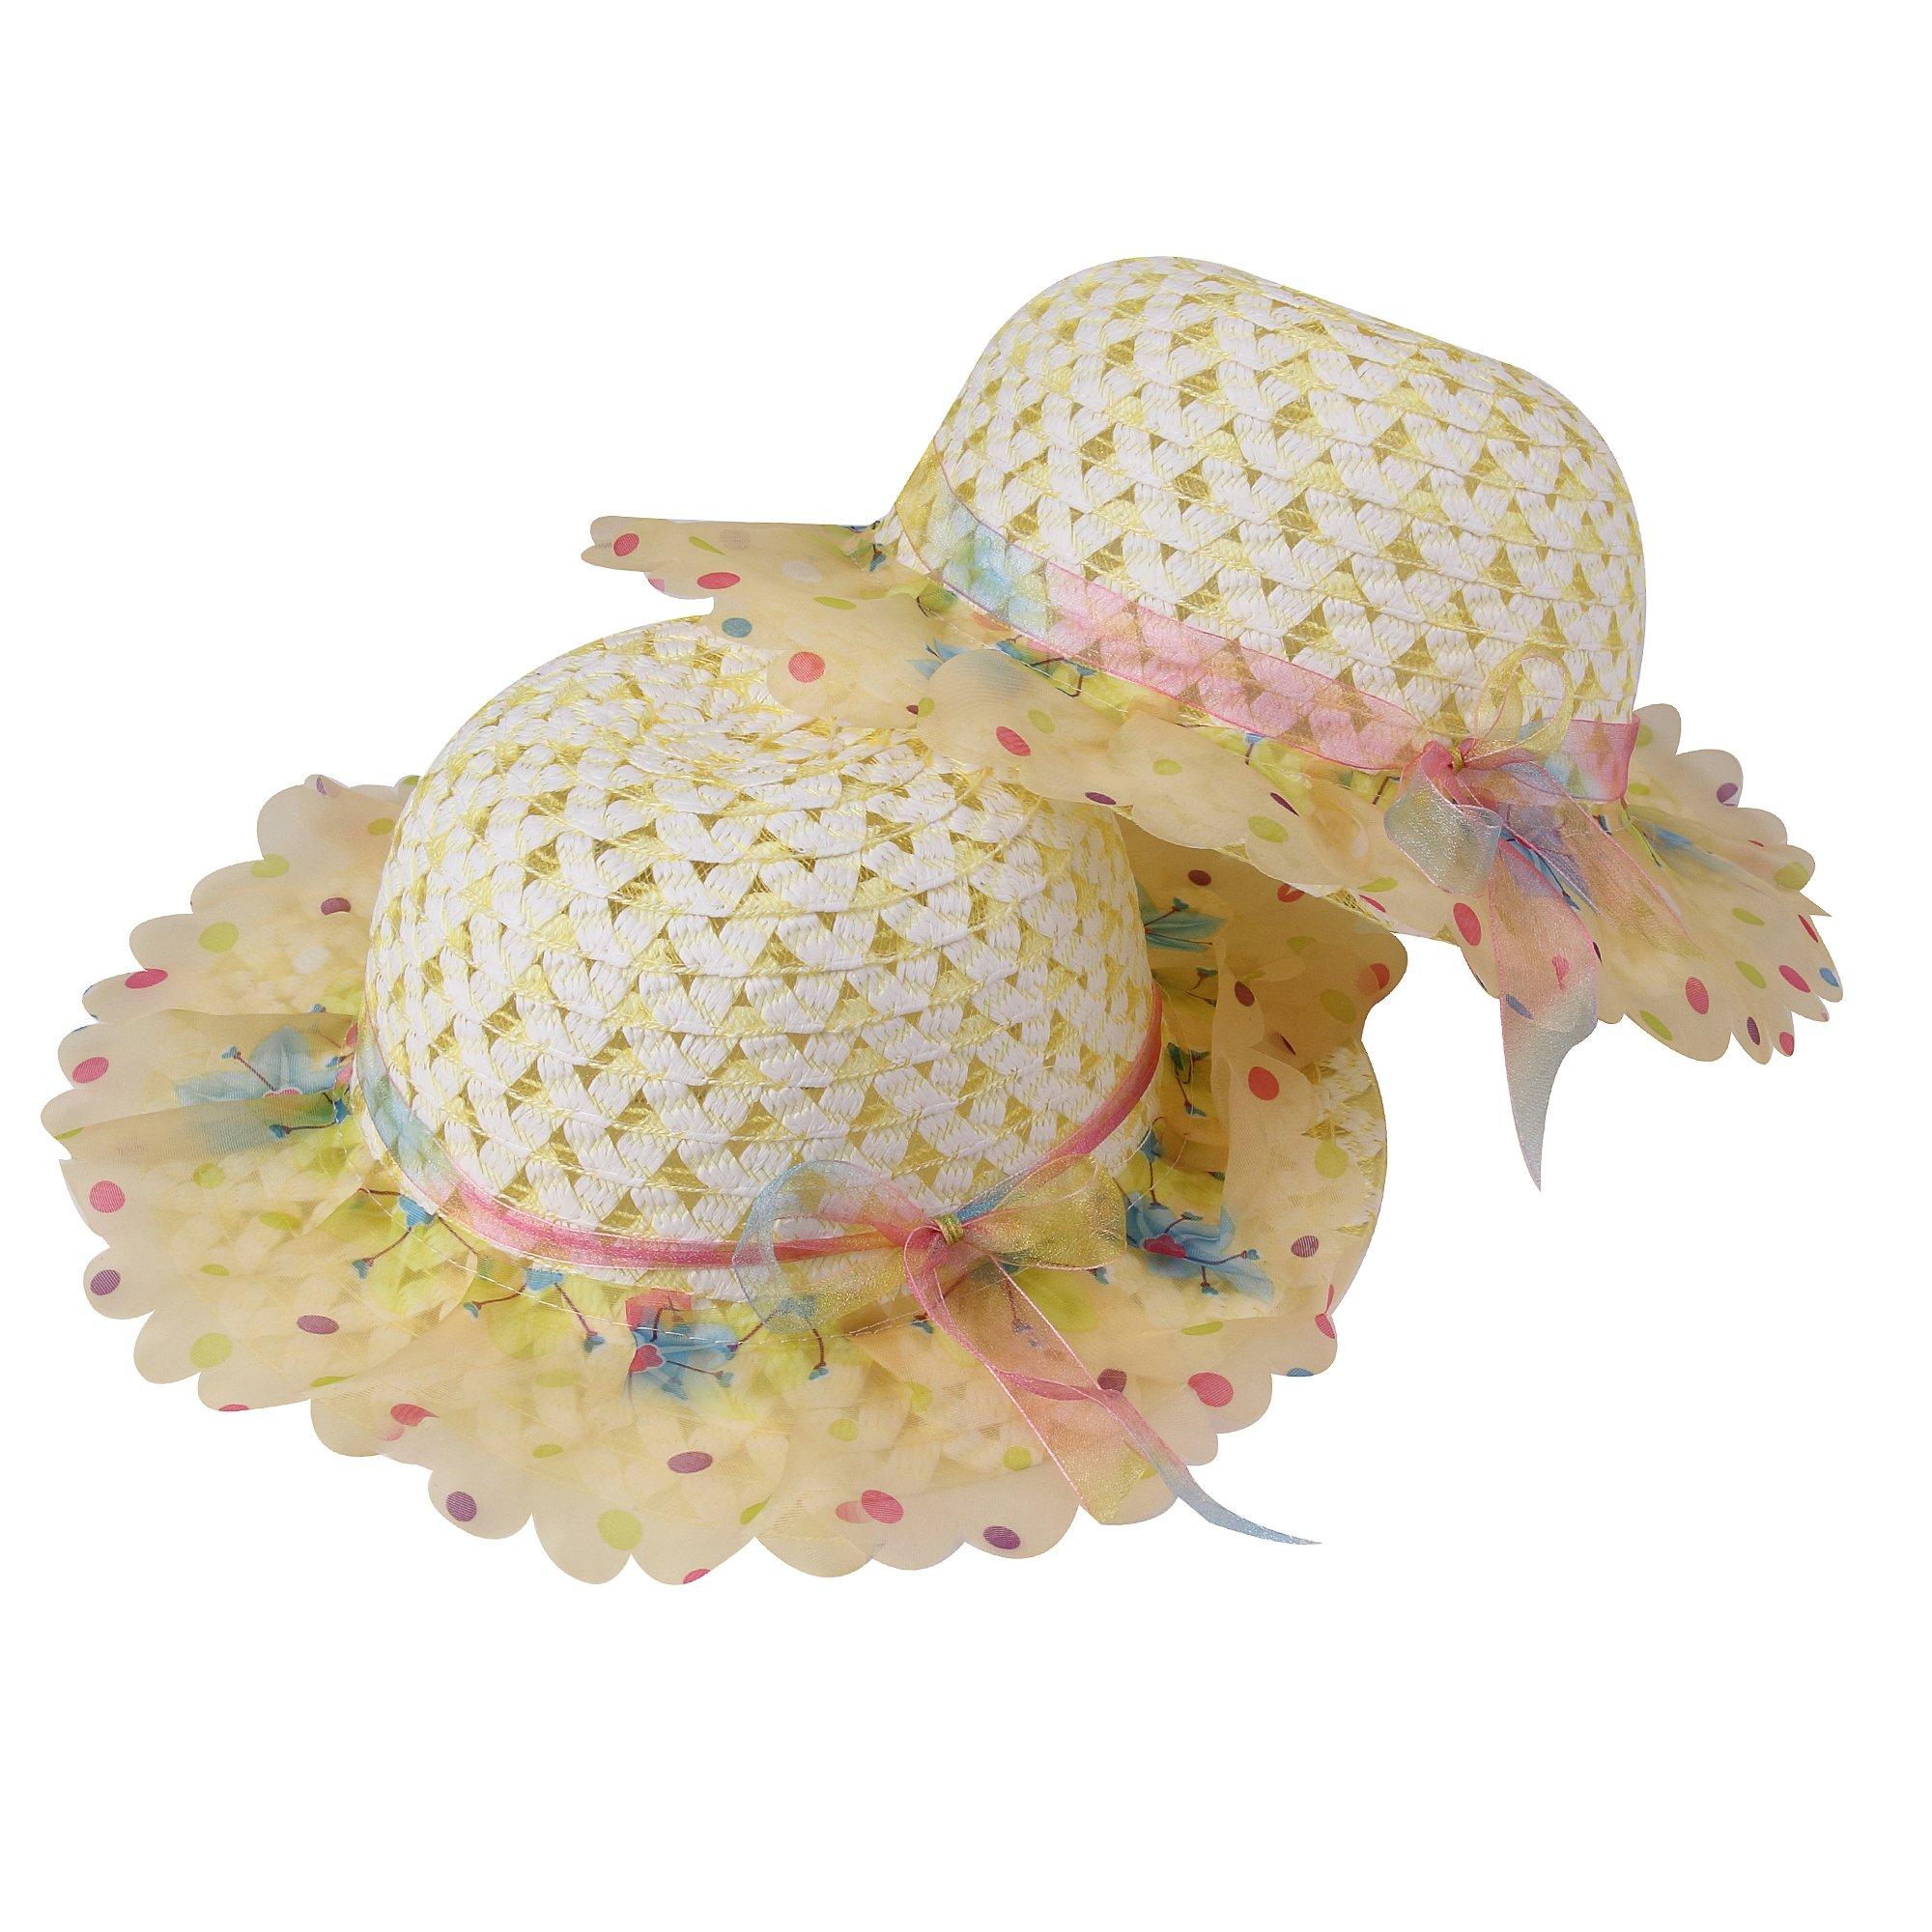 JIAKAI Girls Sunflower Straw Tea Party Hat Set (8 Pcs, Assorted Colors) by JIAKAI